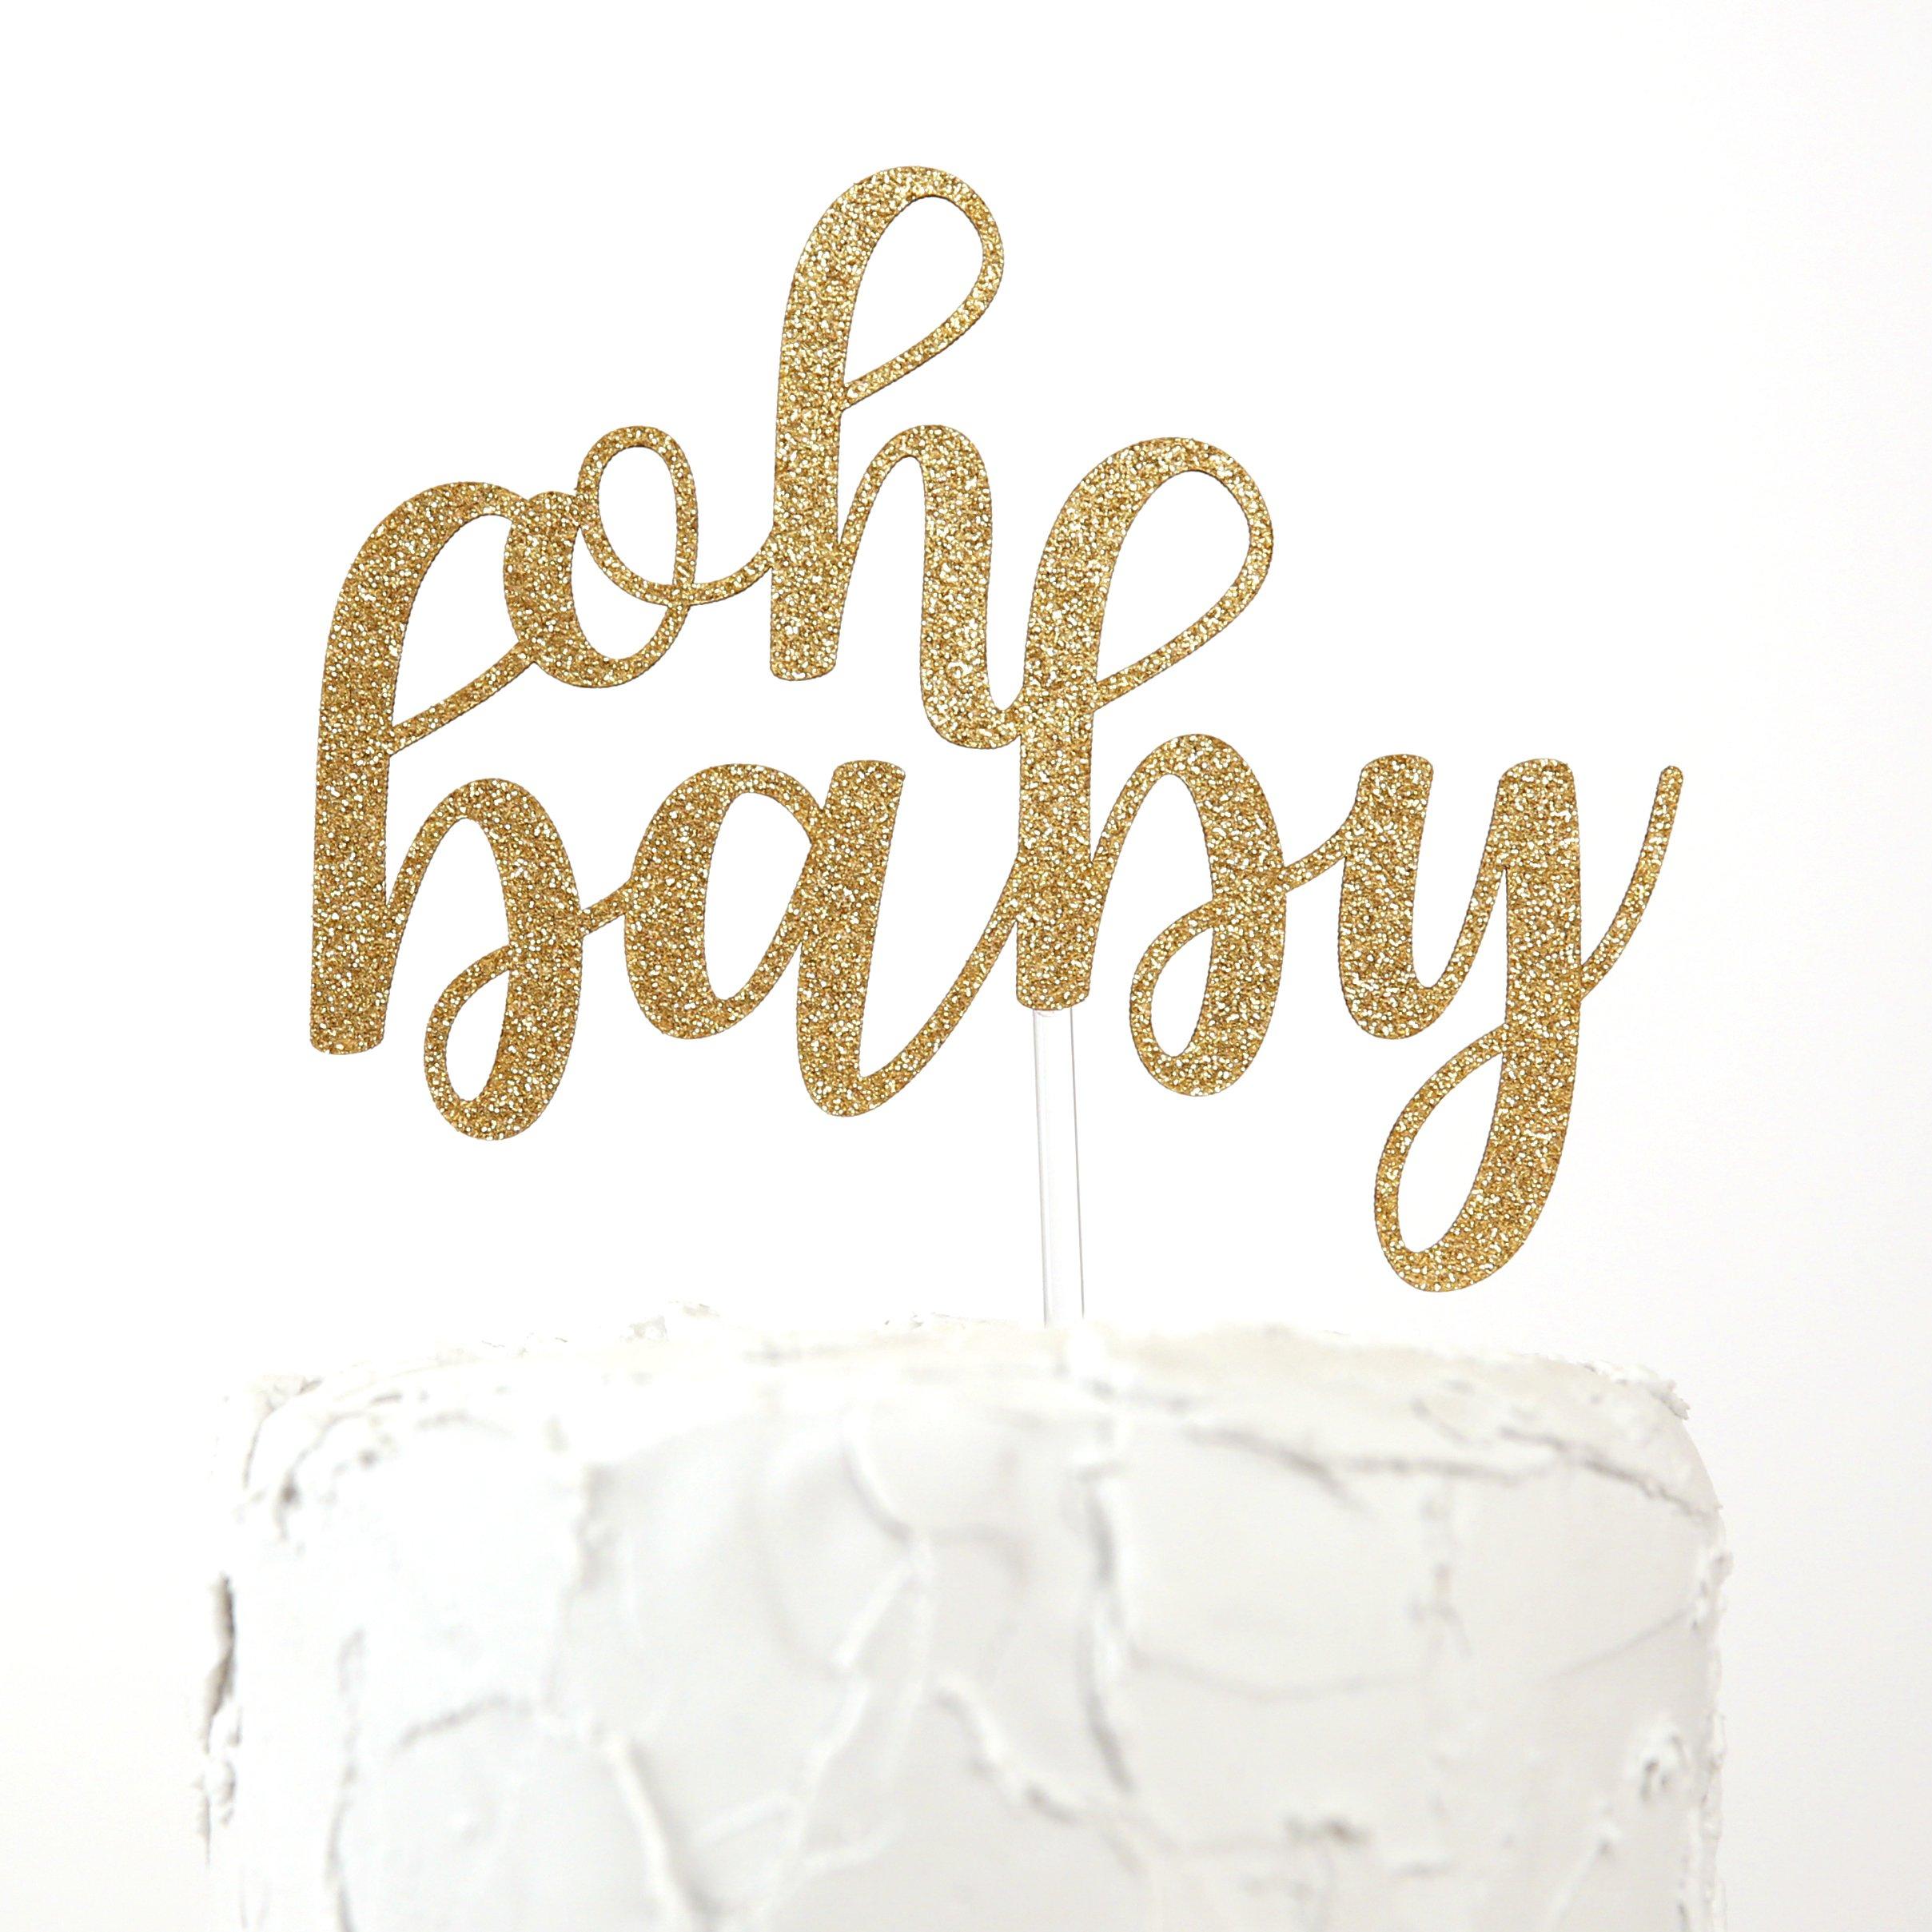 NANASUKO Baby Shower Cake Topper - oh baby - Premium quality Made in USA